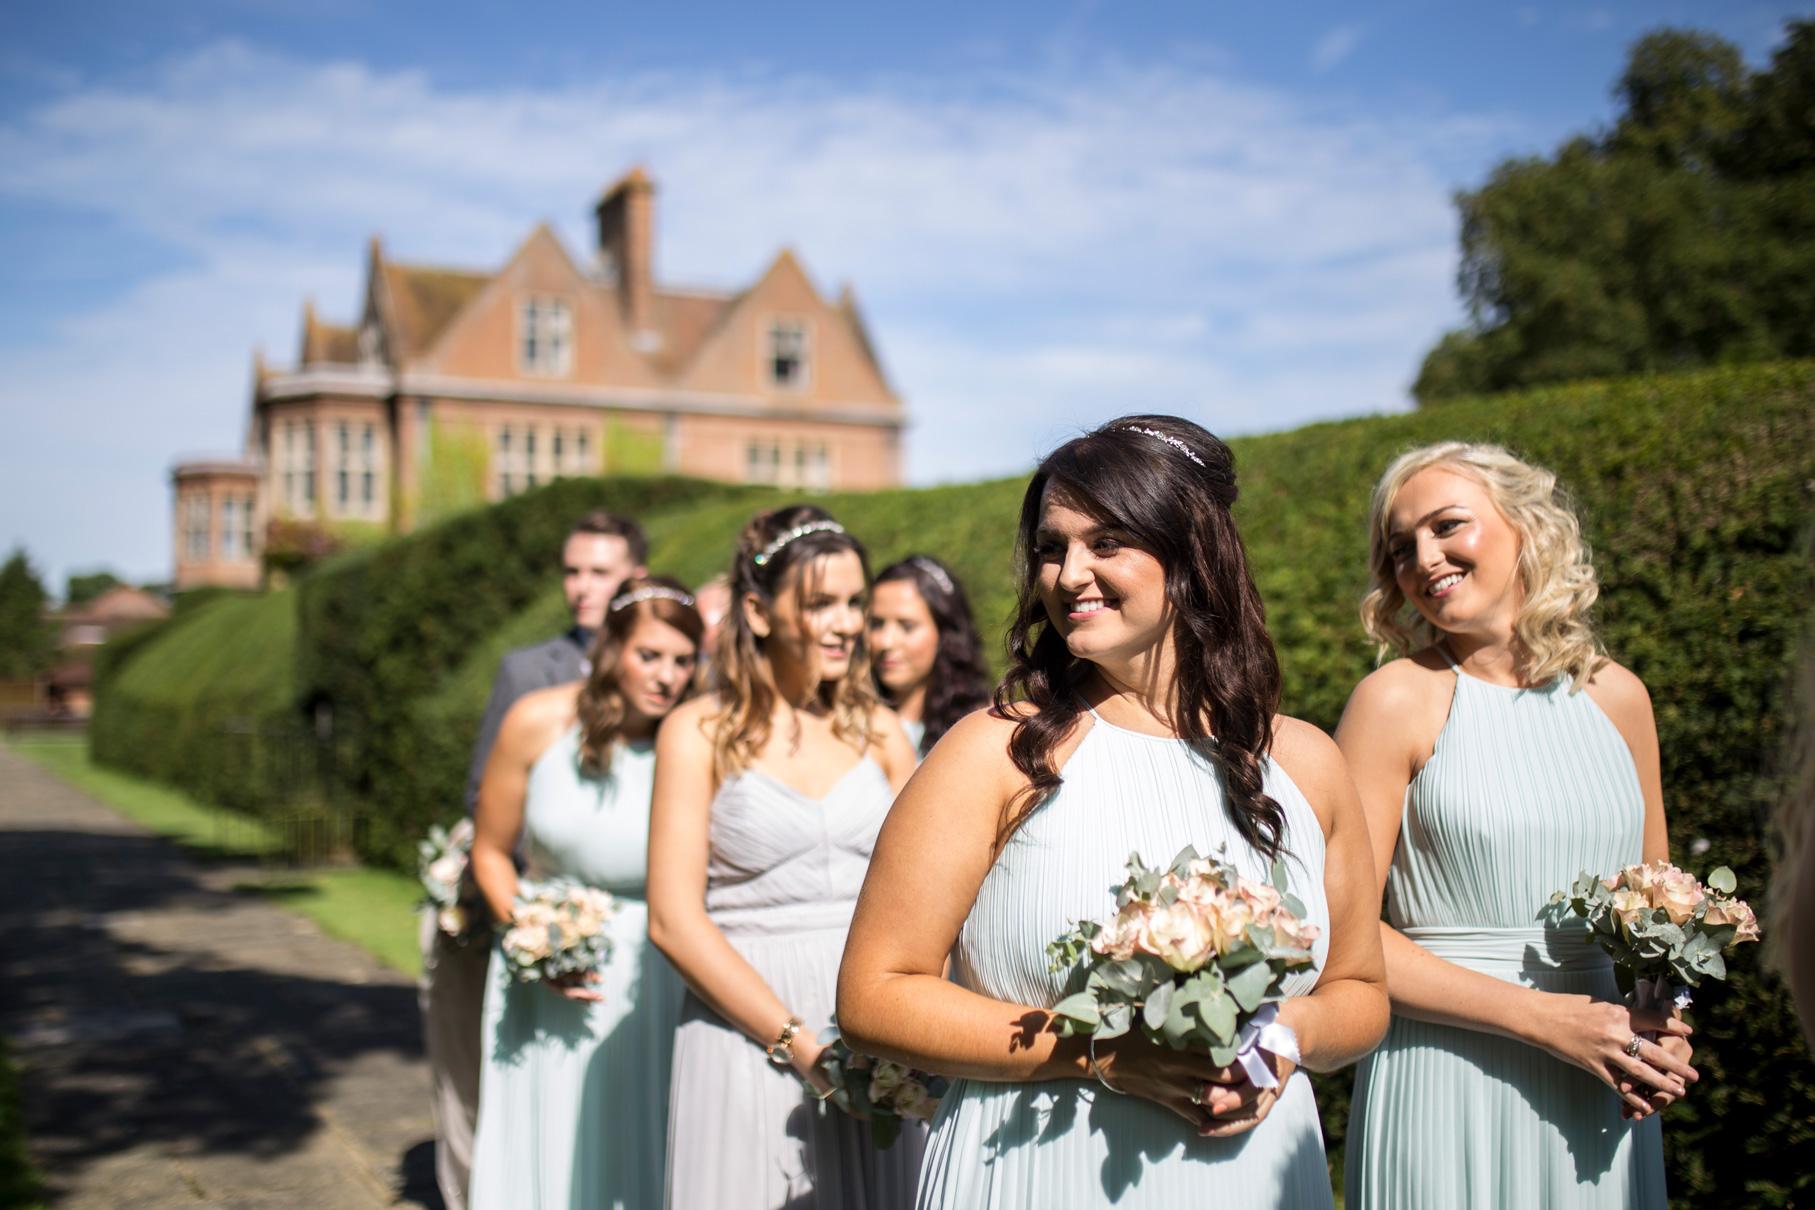 Bridesmaids, horwood house, pale blue, pastel dresses, outside ceremony,